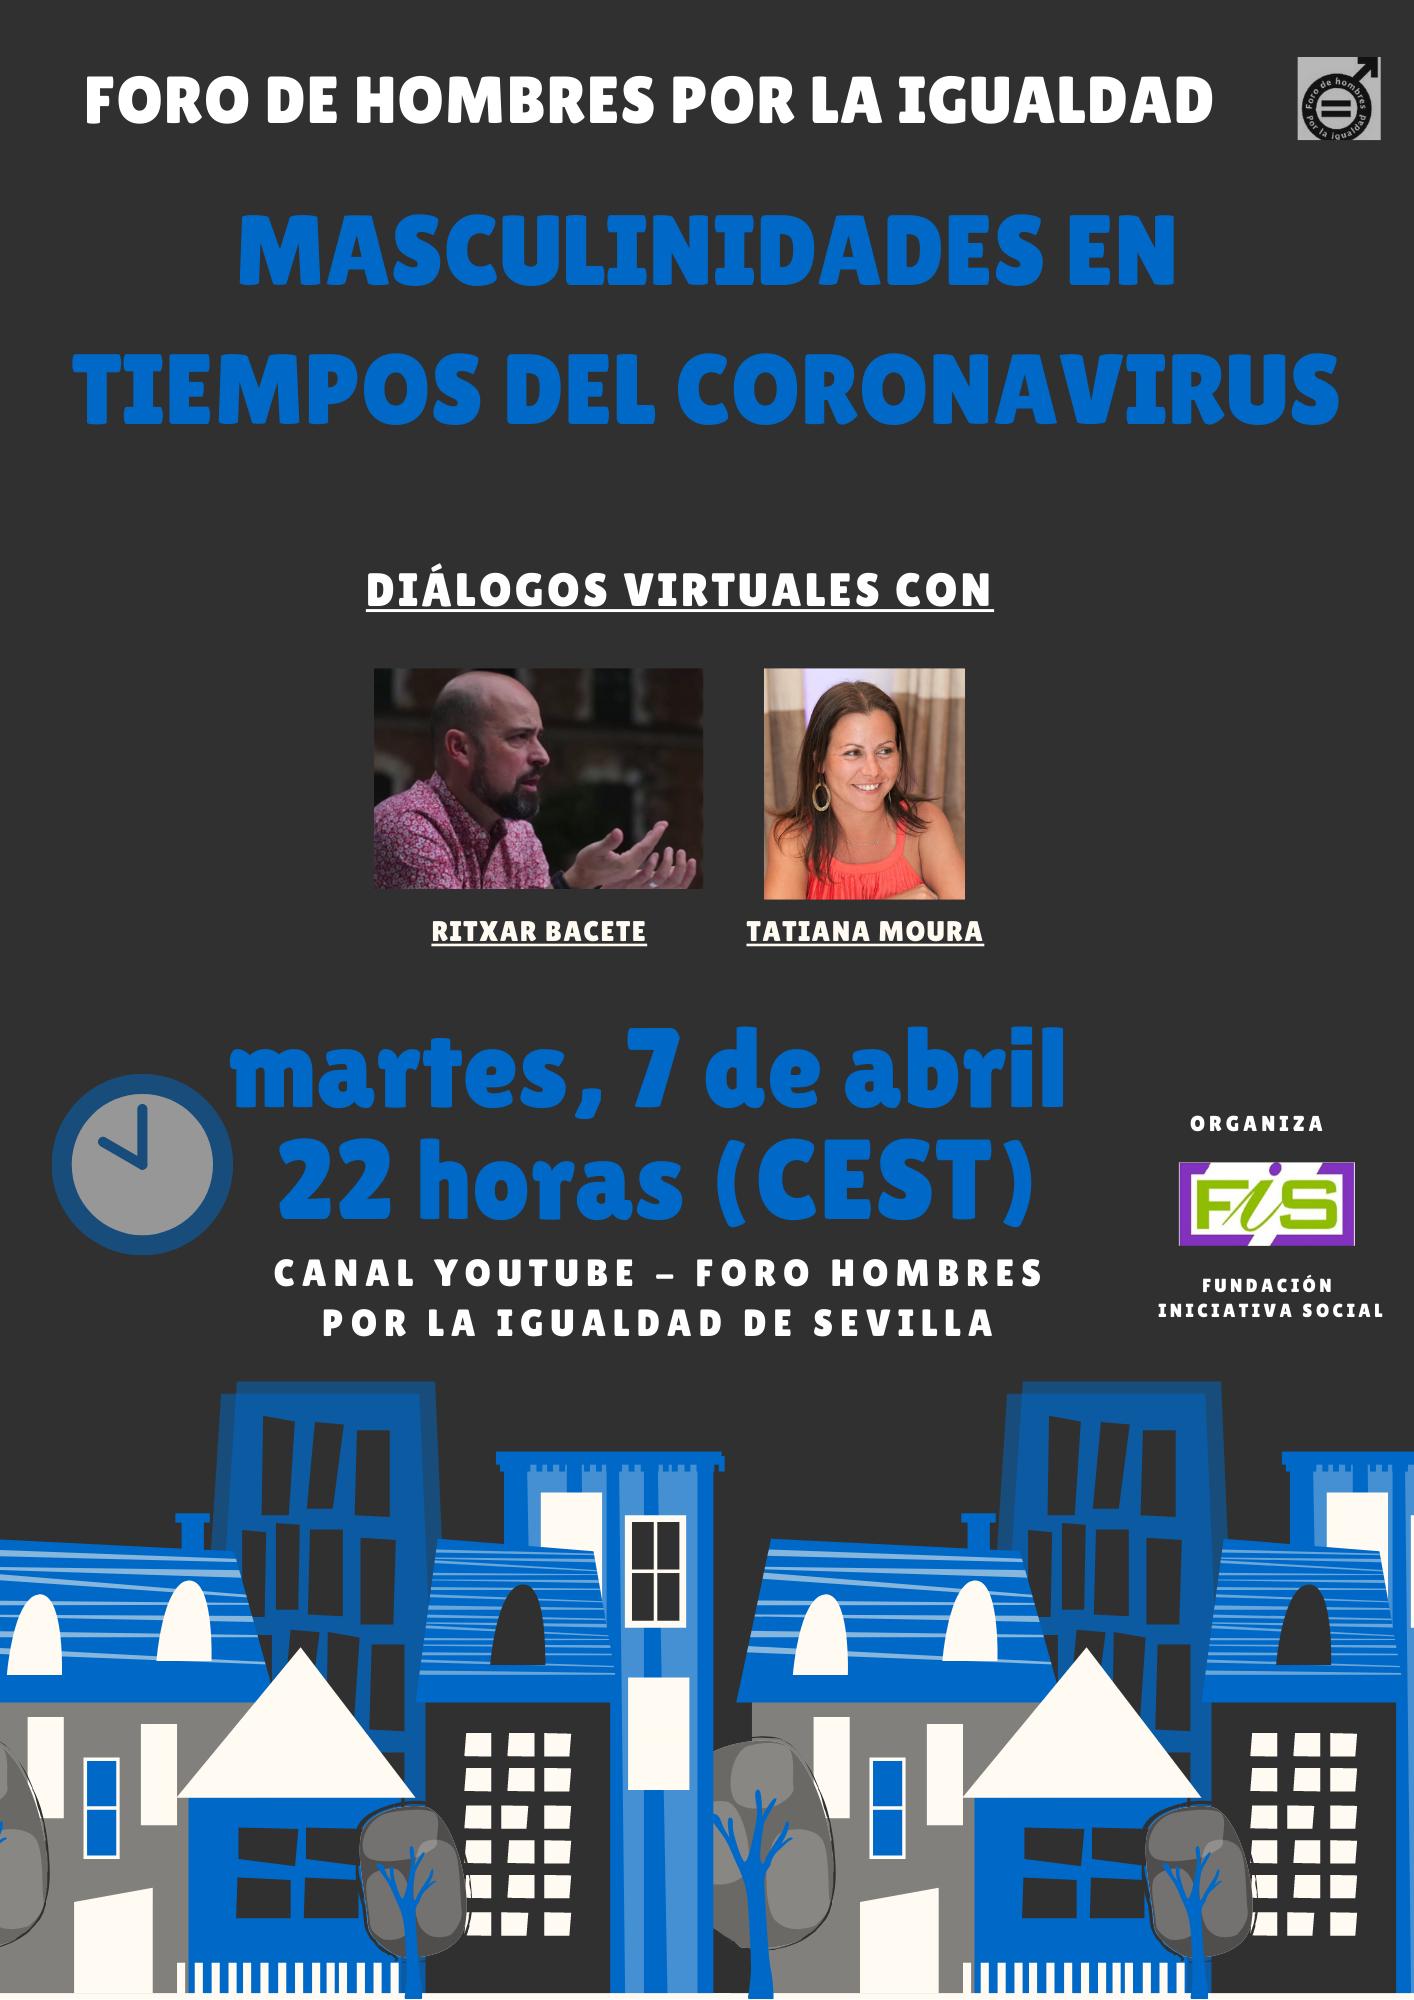 Diálogo virtual Ritxar Bacete y Tatiana Moura